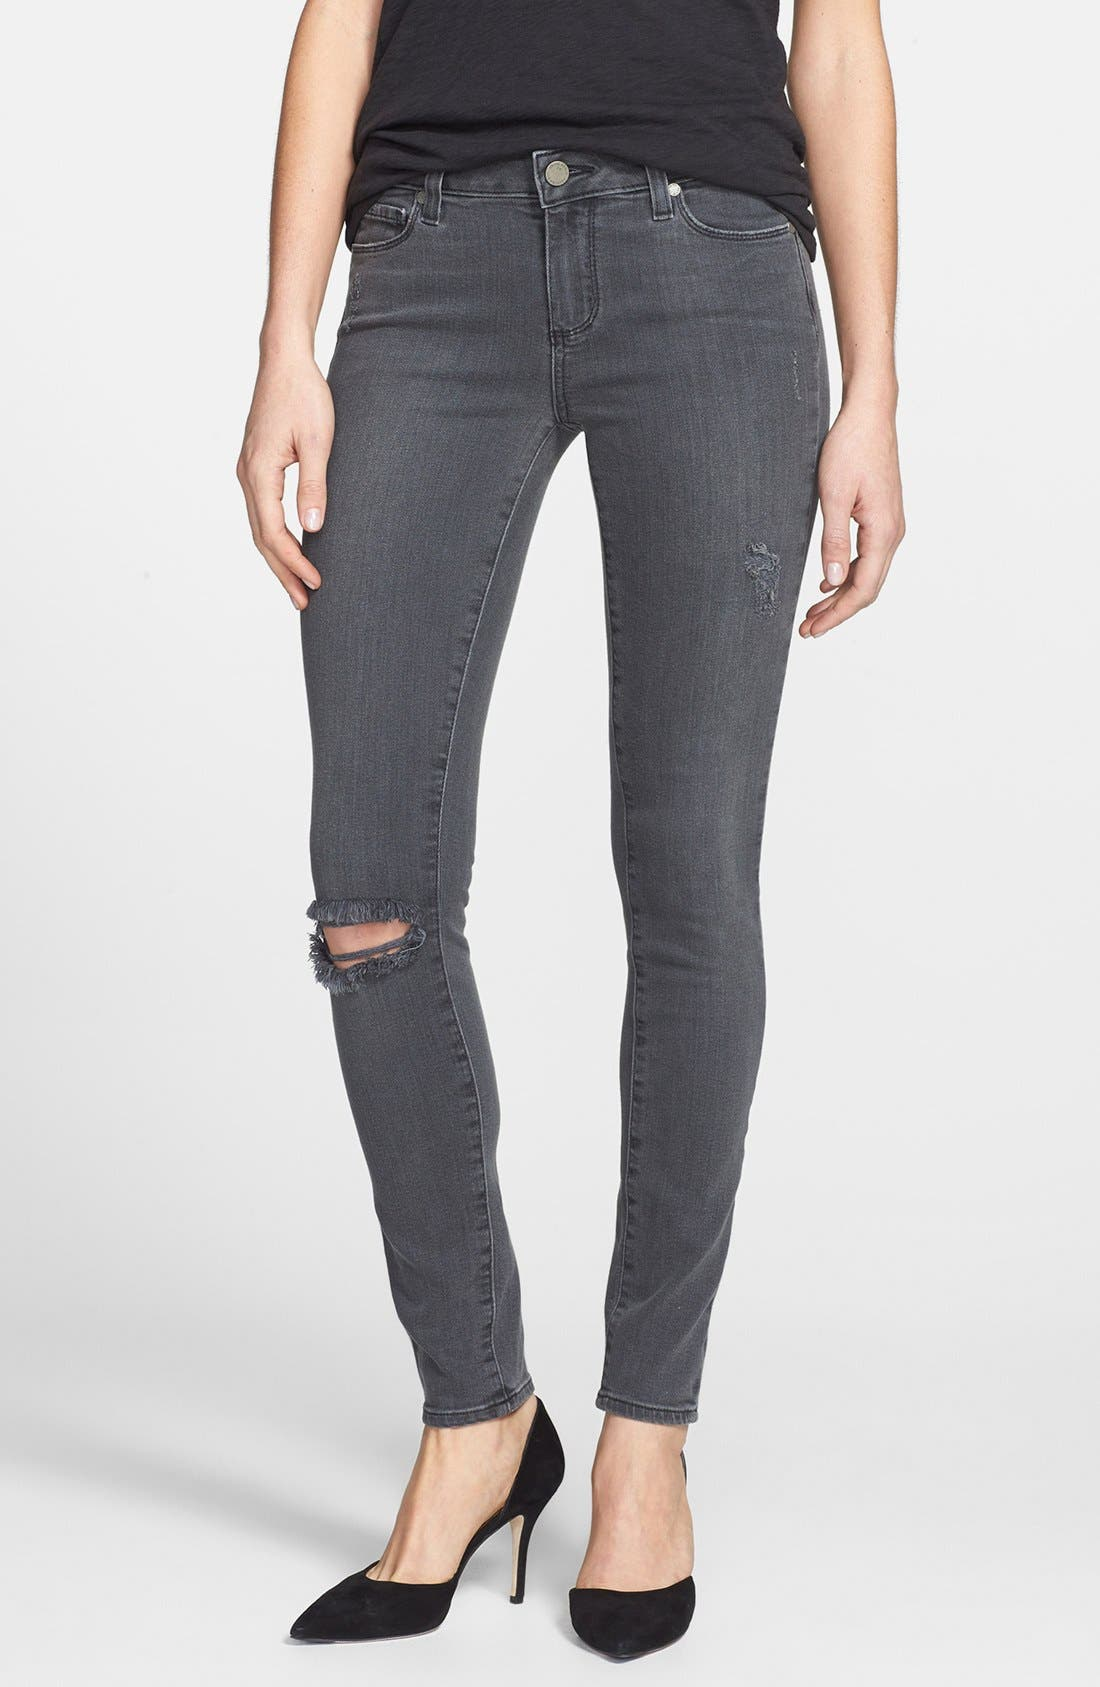 Alternate Image 1 Selected - Paige Denim 'Verdugo' Distressed Ultra Skinny Jeans (Kate Destructive)